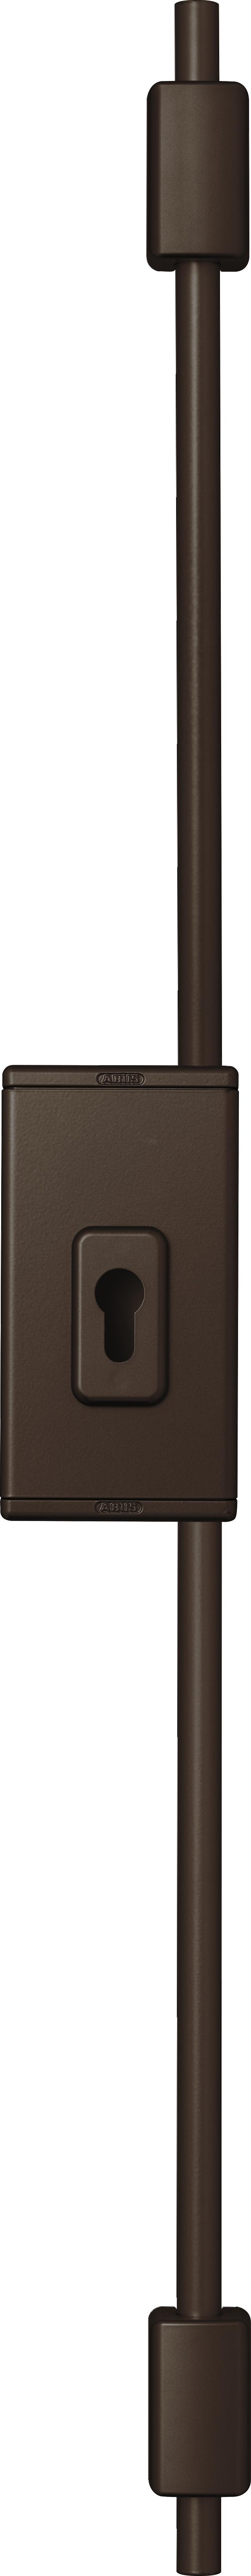 Tür-Stangenschloss TSS550 B ohne Zylinder